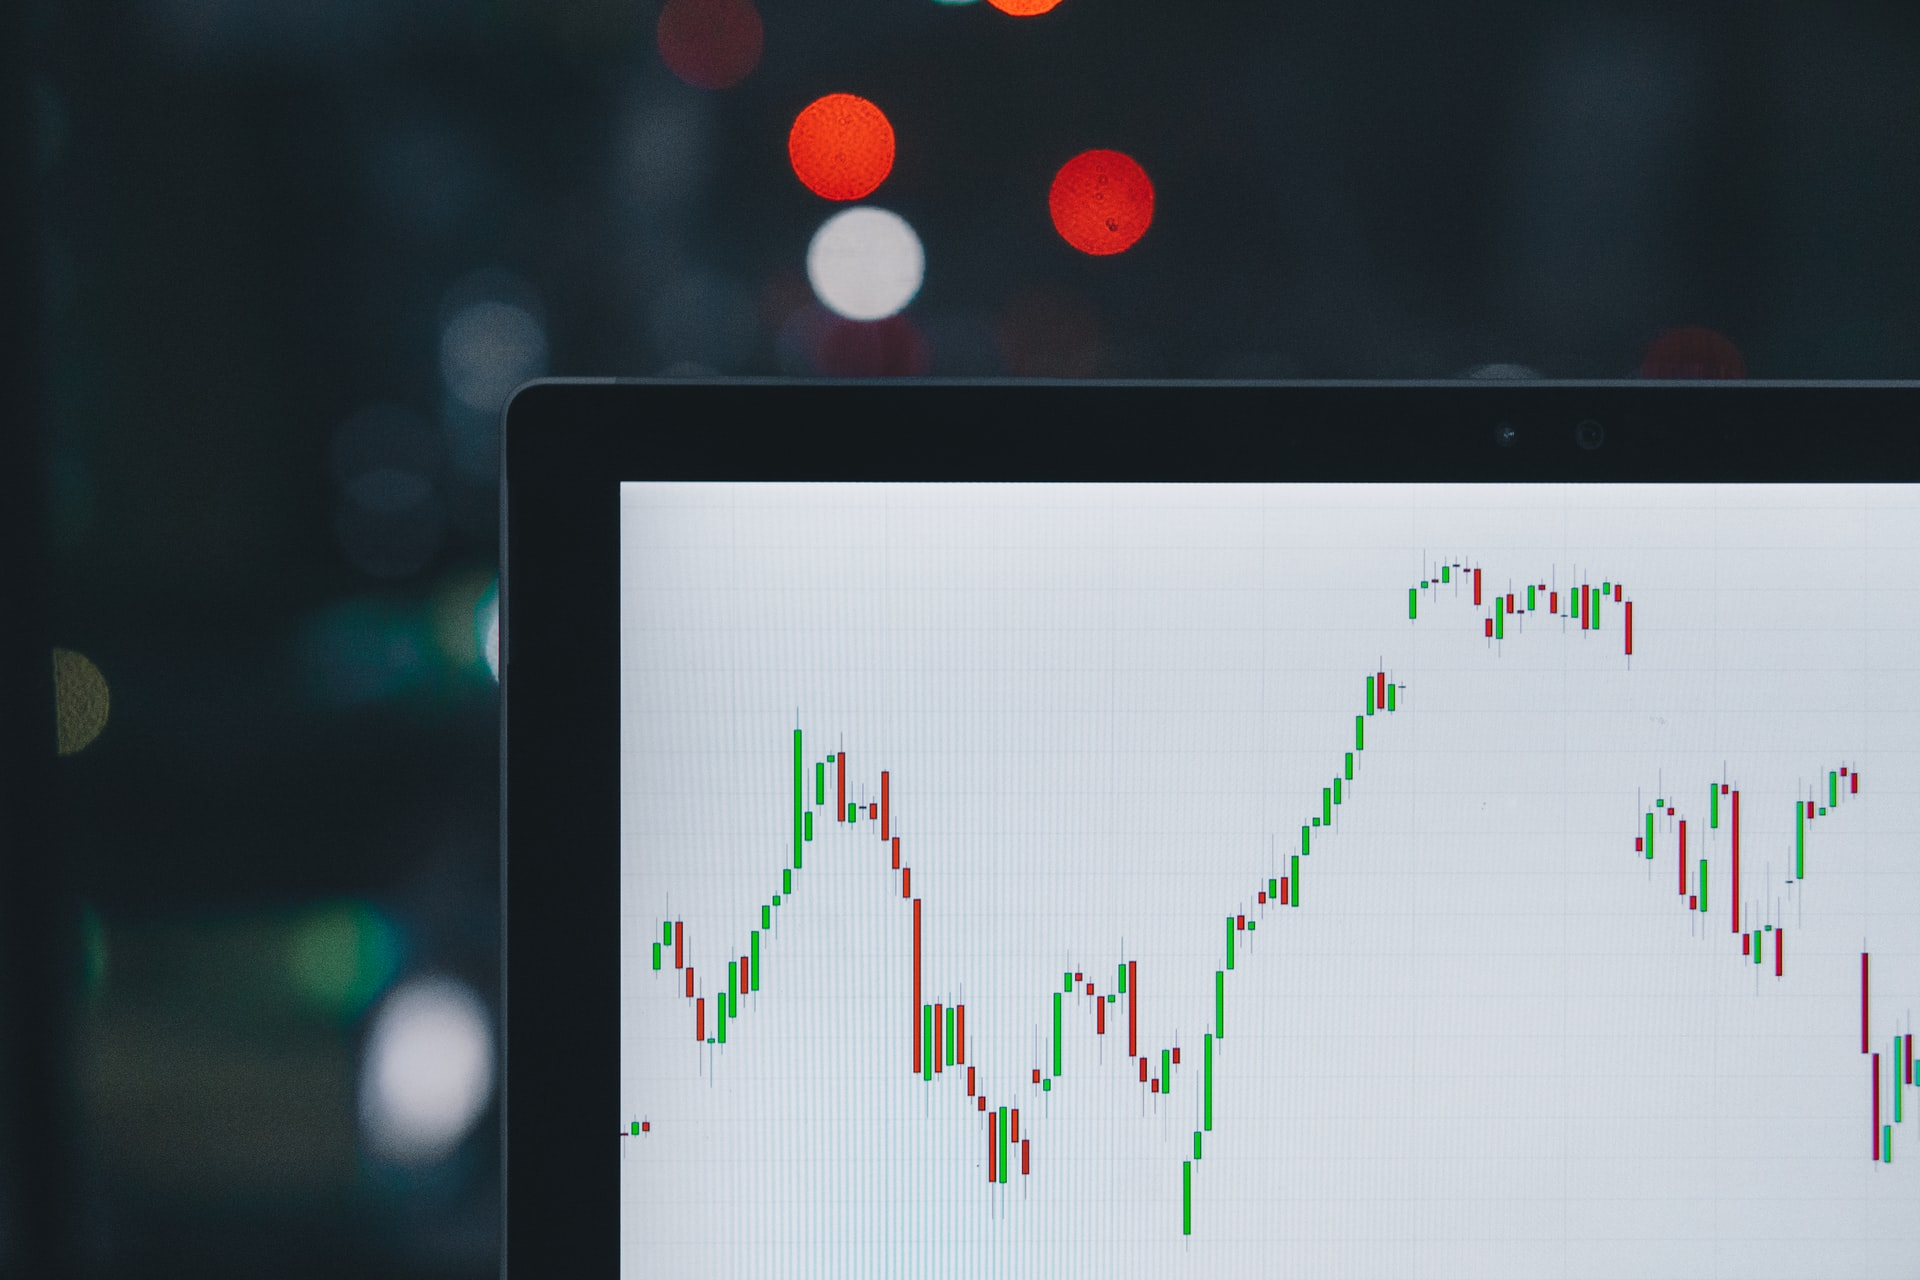 7 consejos para invertir a largo plazo